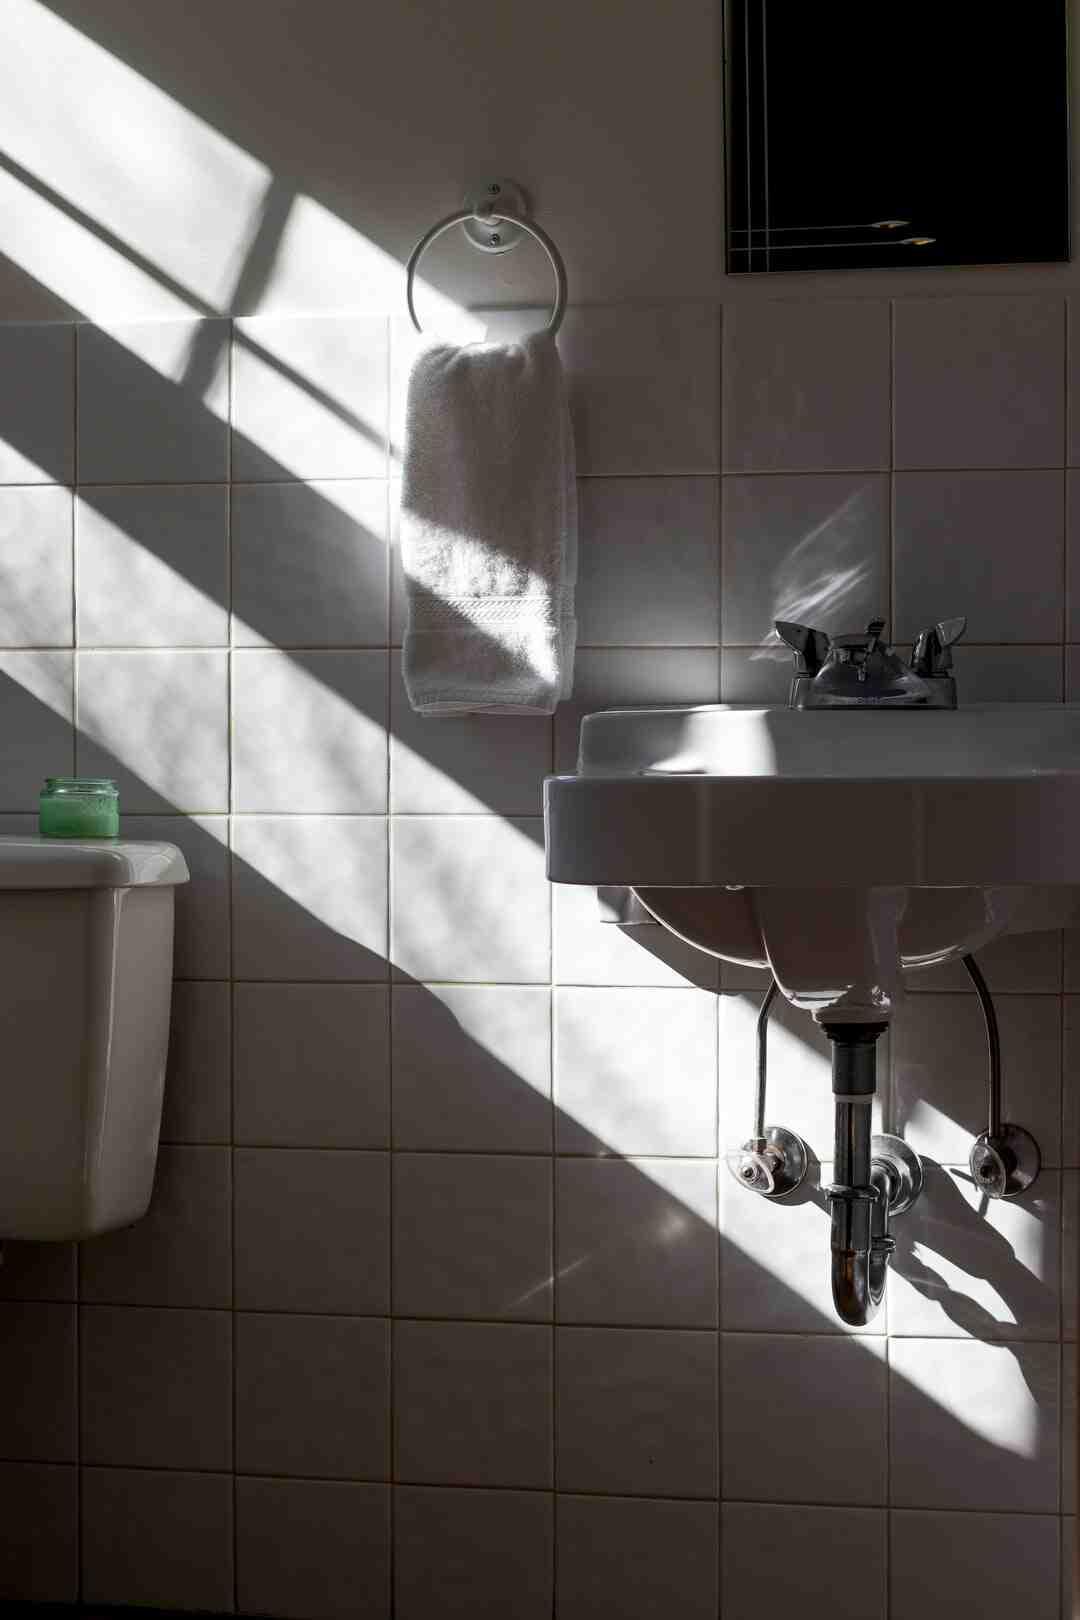 Comment installer plomberie salle de bain